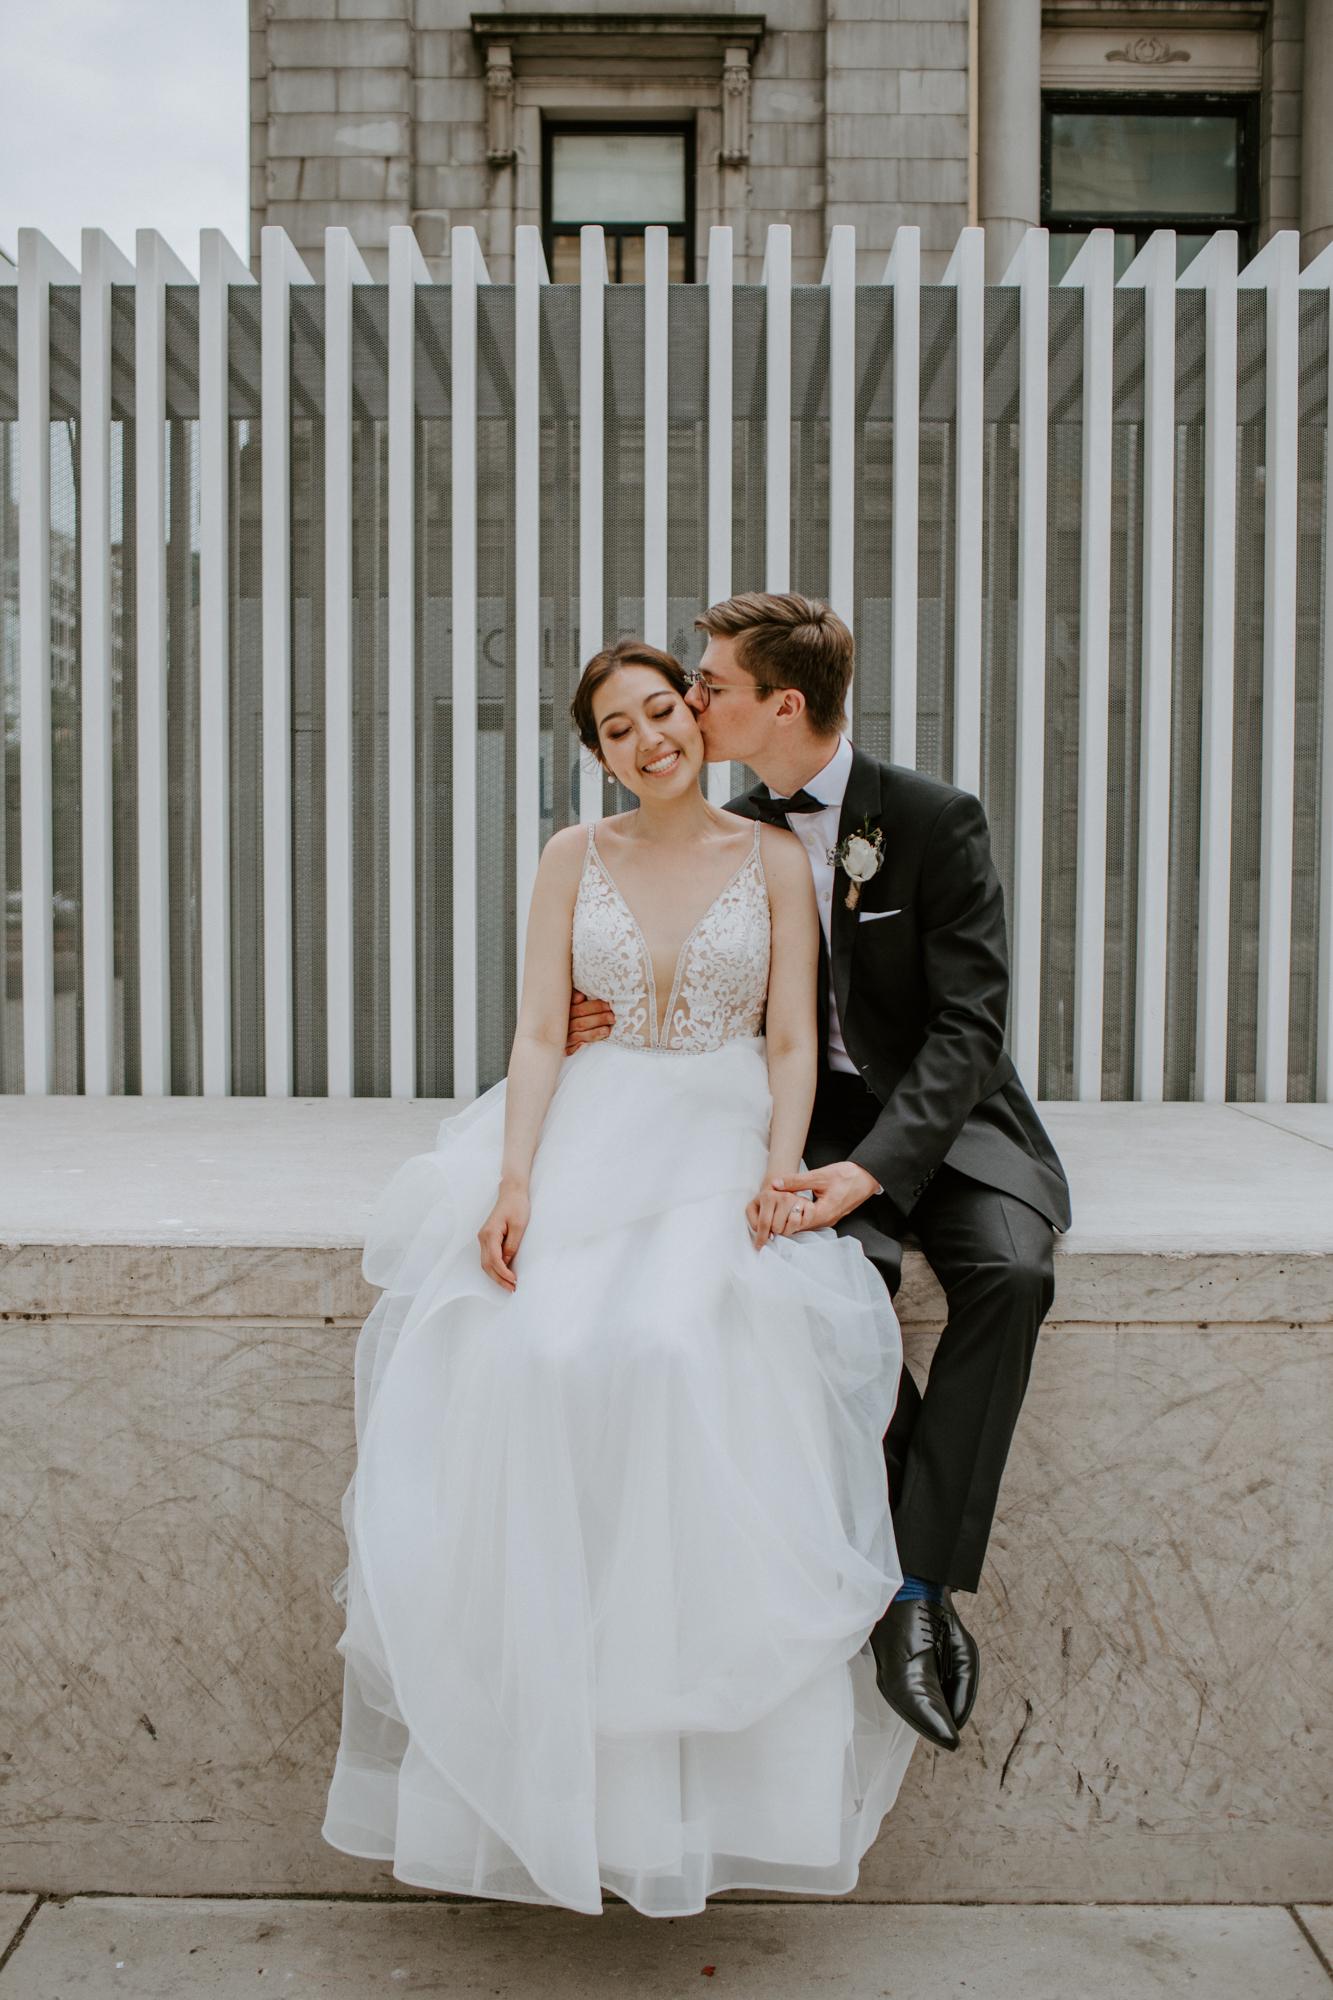 Yelim& Sorin- Wedding Day- HL-SD-385.JPG